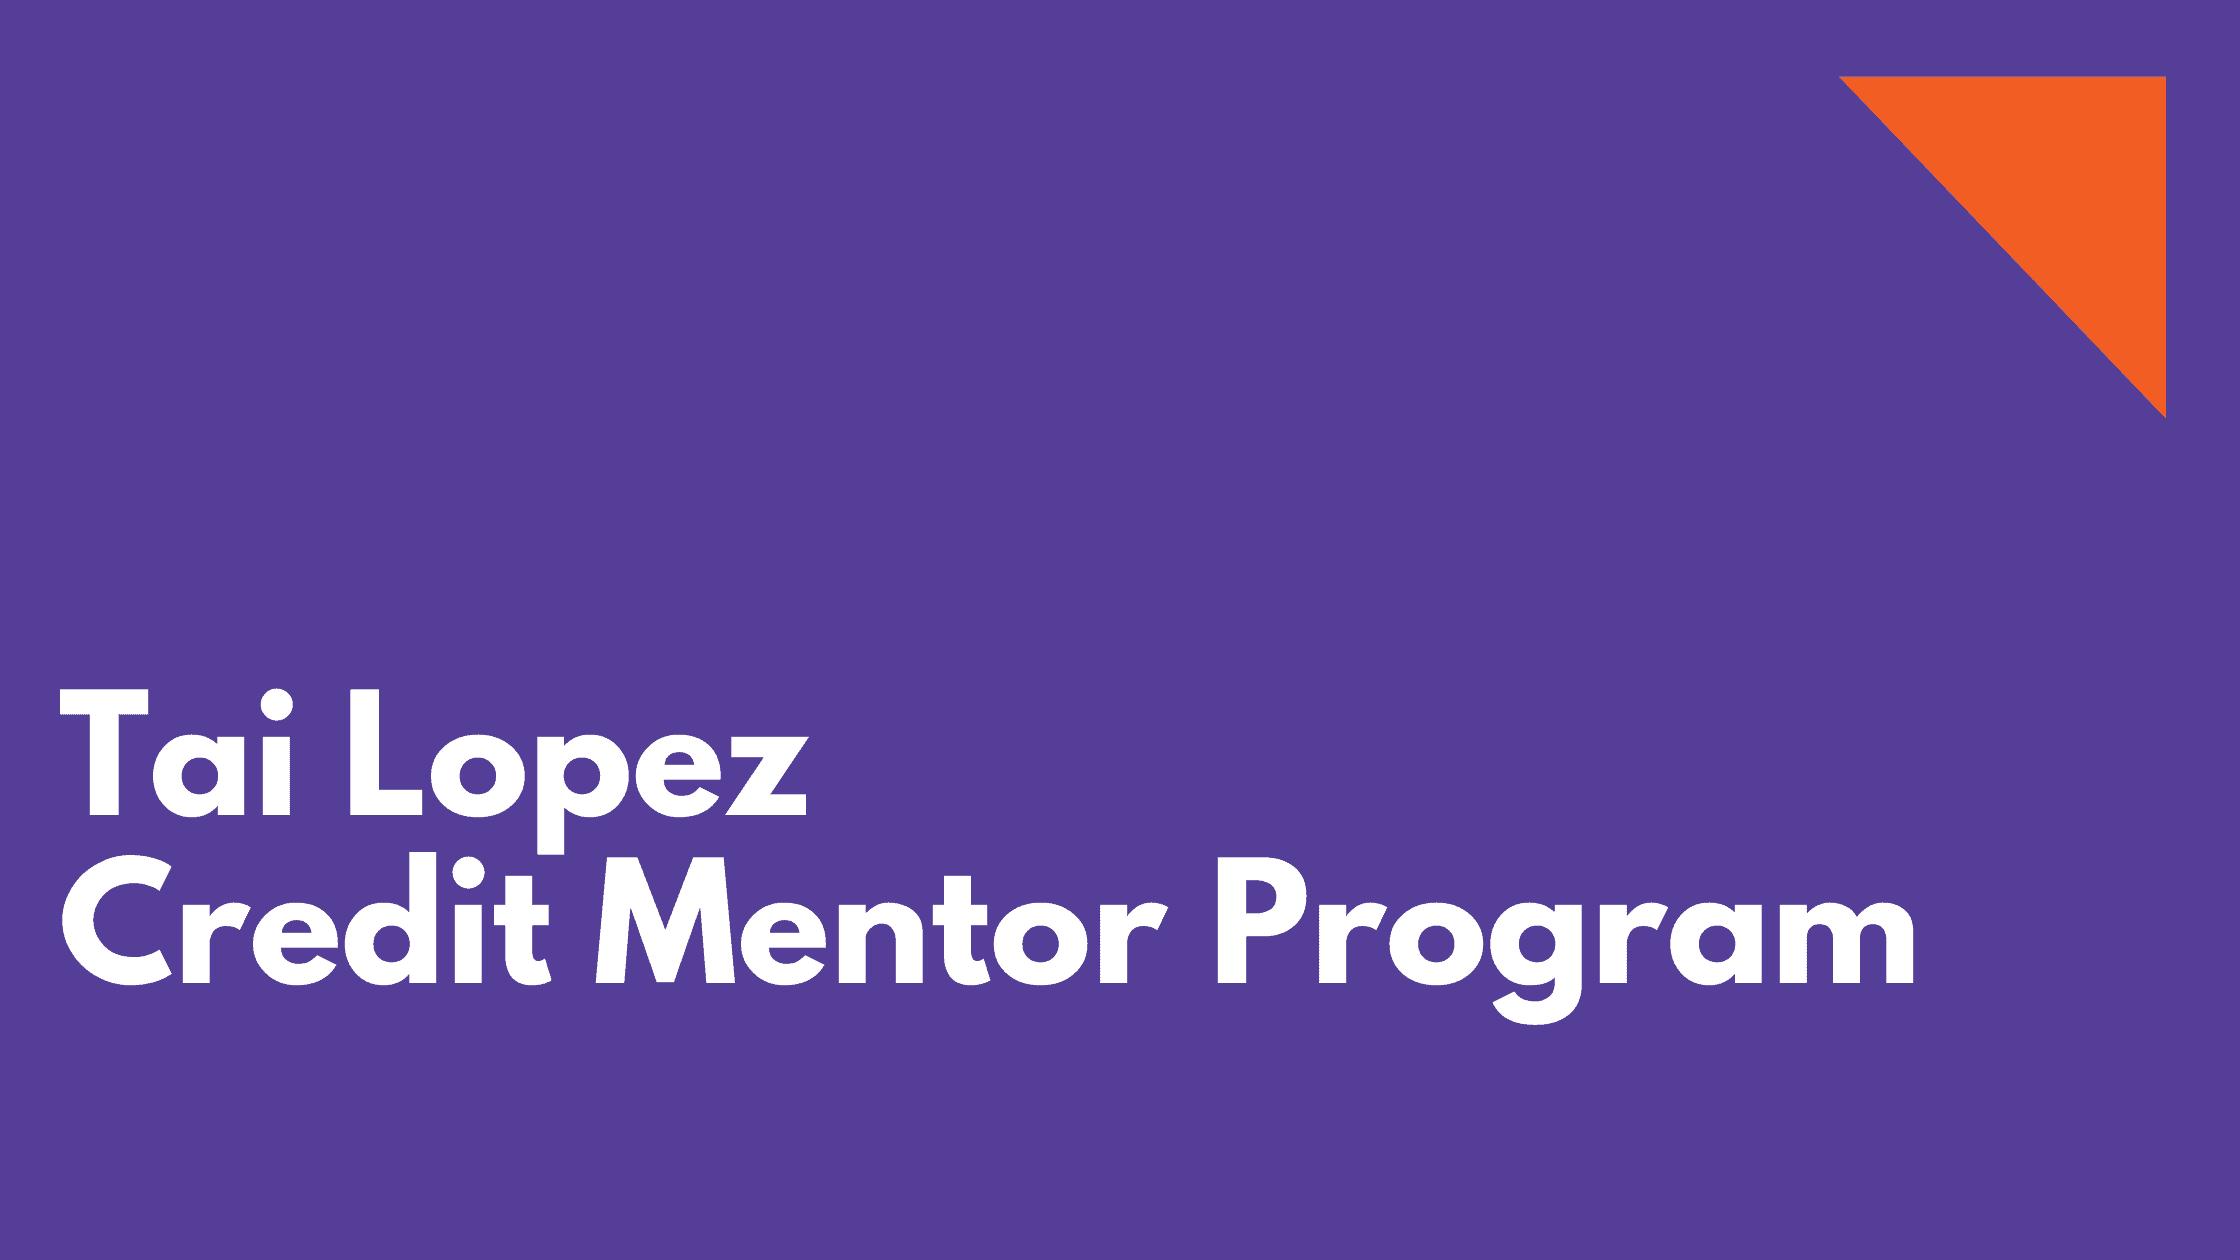 Tai Lopez credit mentor program